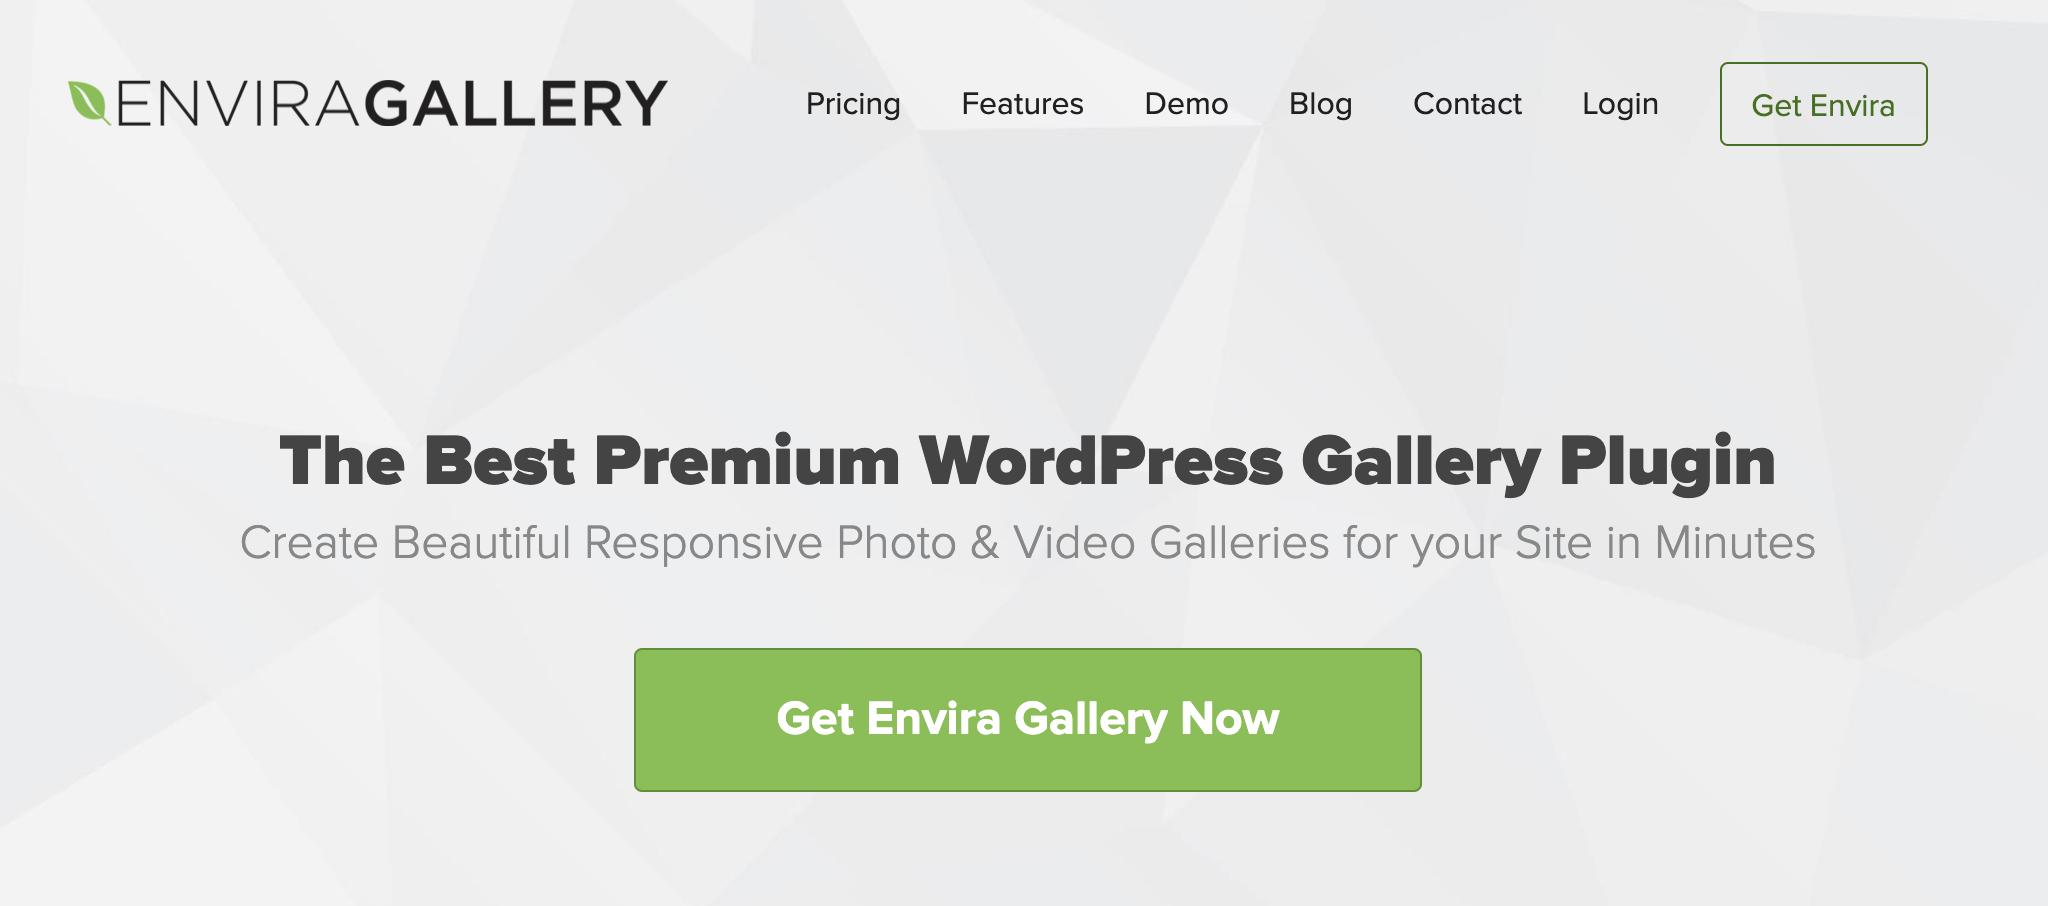 Envira Gallery WordPress Plugin